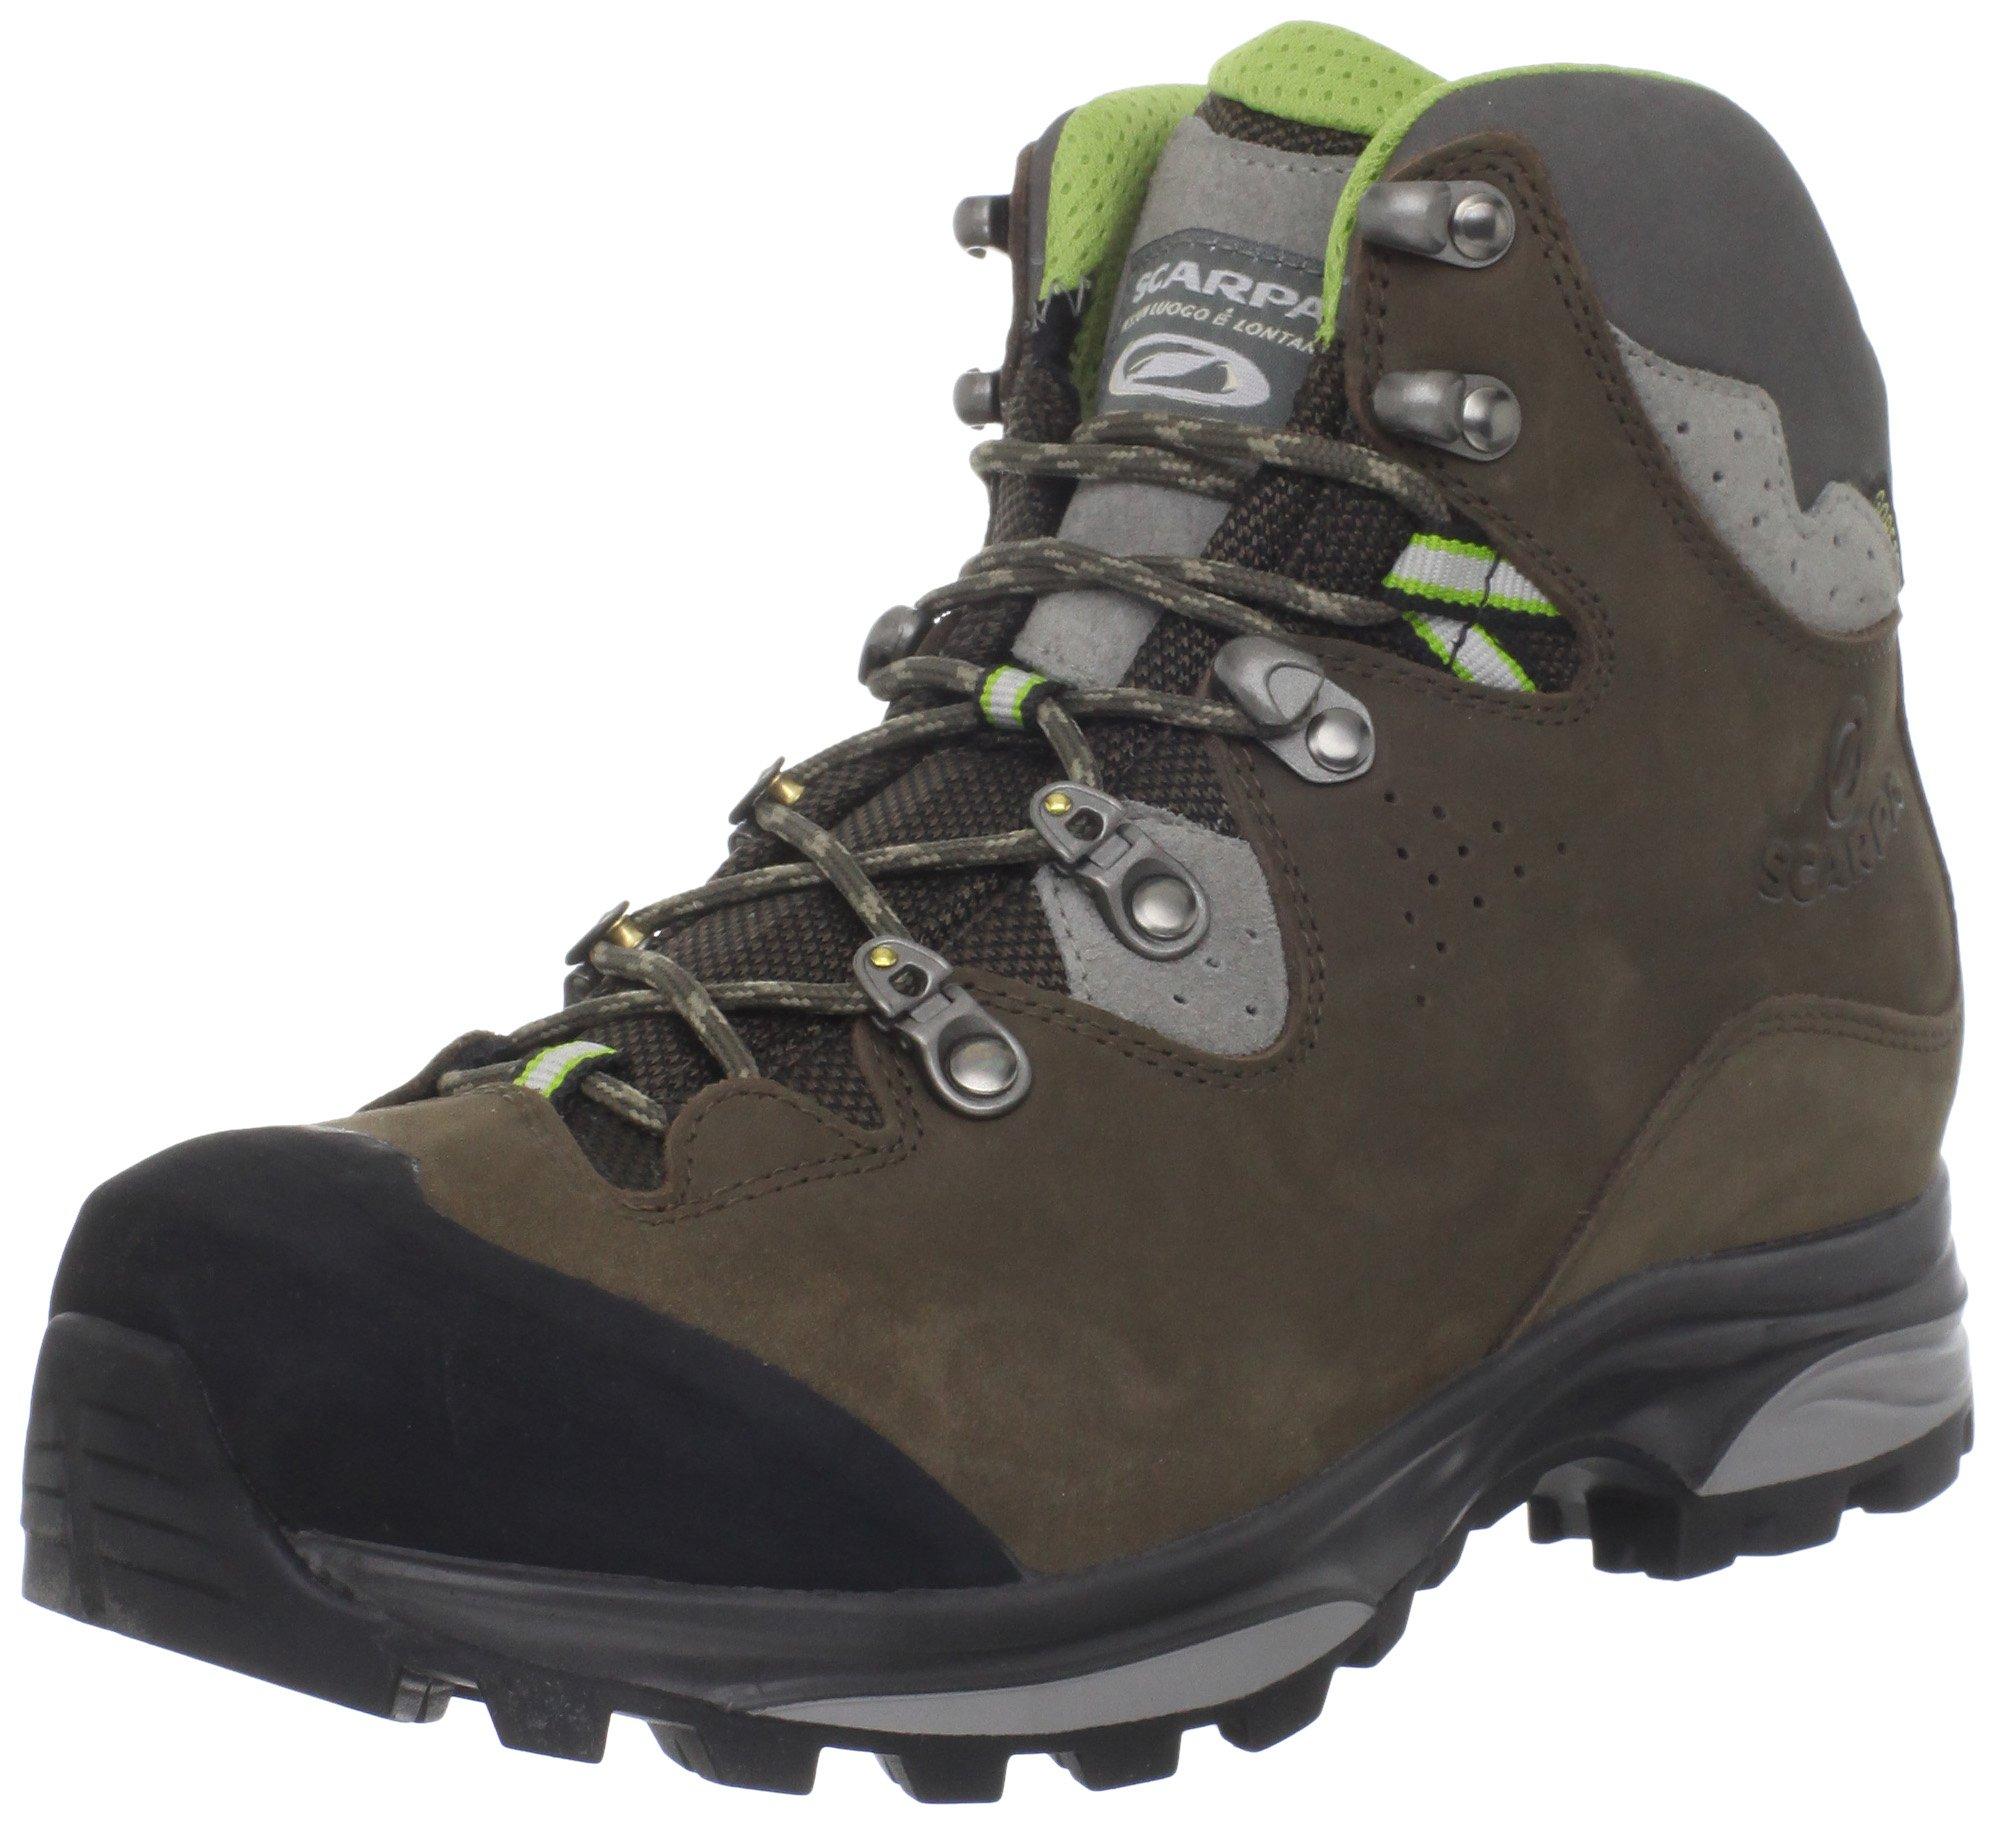 Scarpa Women's Hunza GTX Hiking Boot,Dark Brown,41.5 EU/9.5 M US